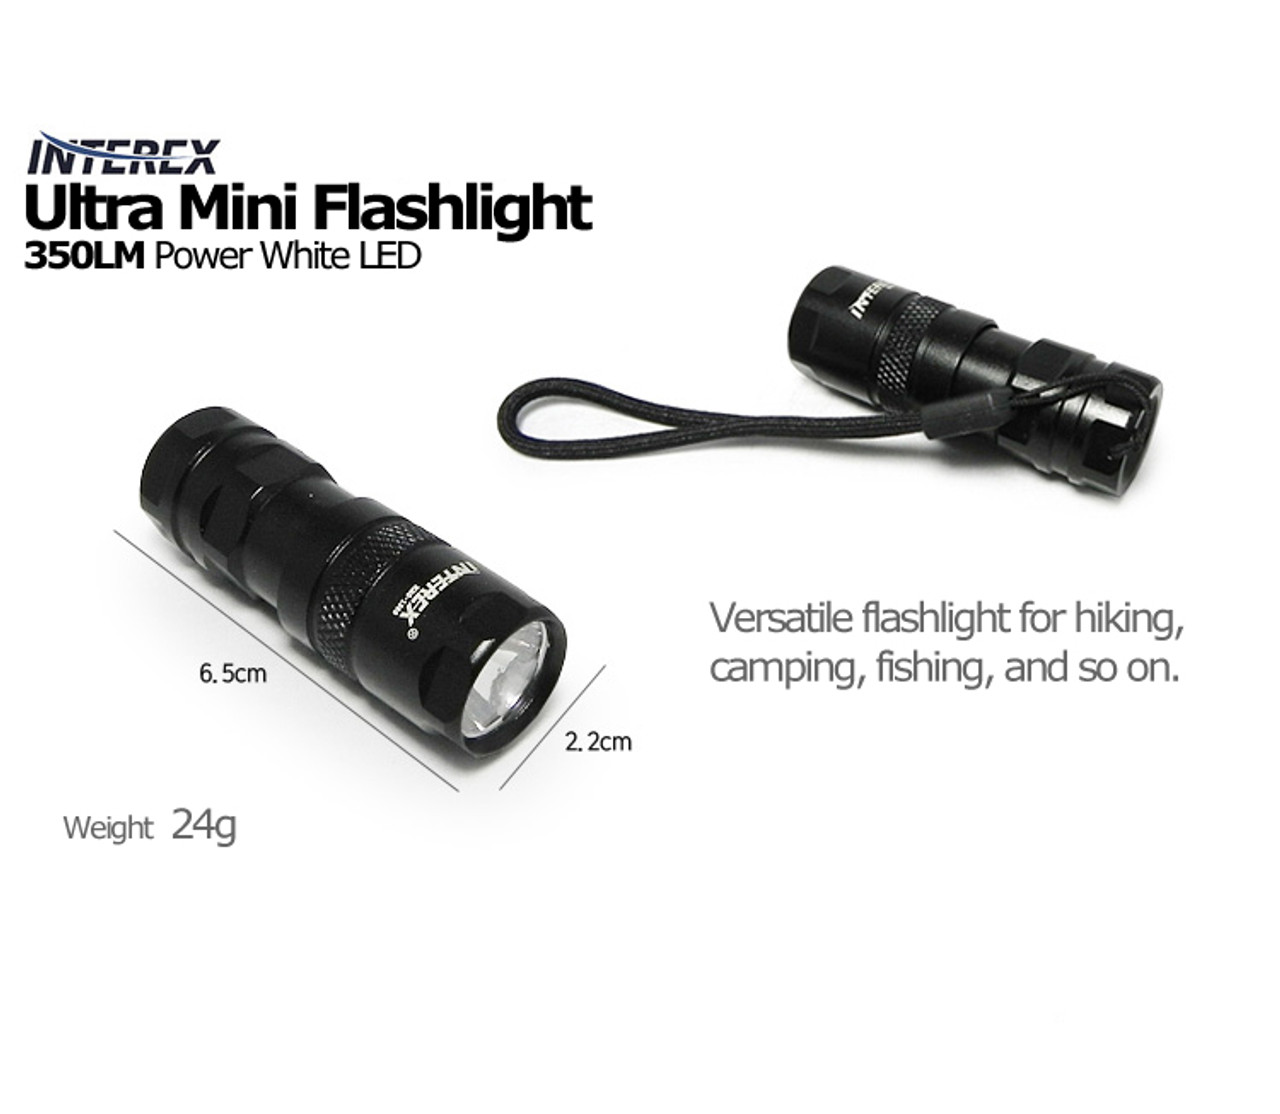 New INTEREX 350LM White Power LED Ultra Mini Flashlight Black